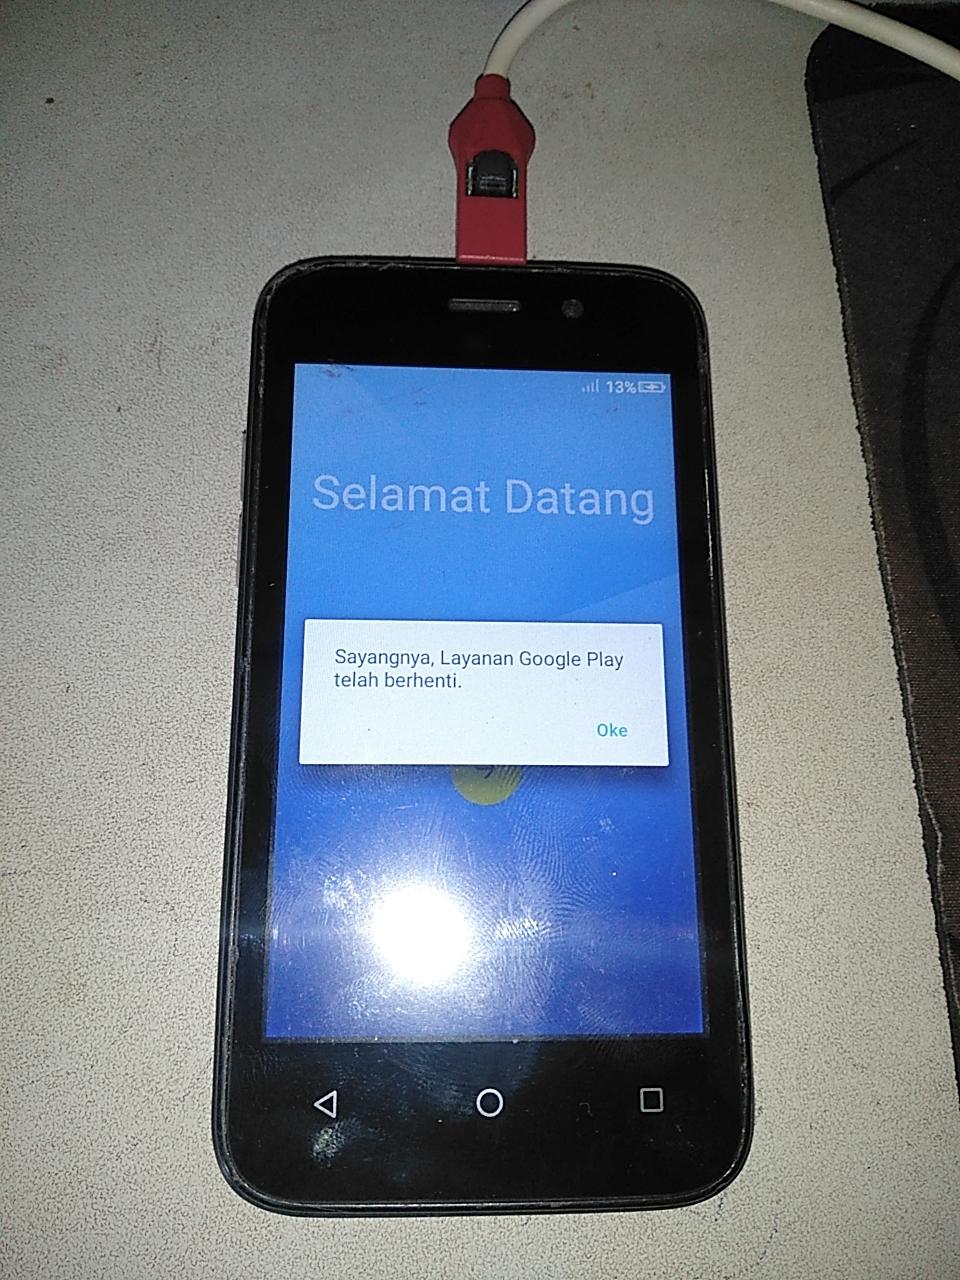 Advan S4Z Plus Layanan Google Play Telah Terhenti